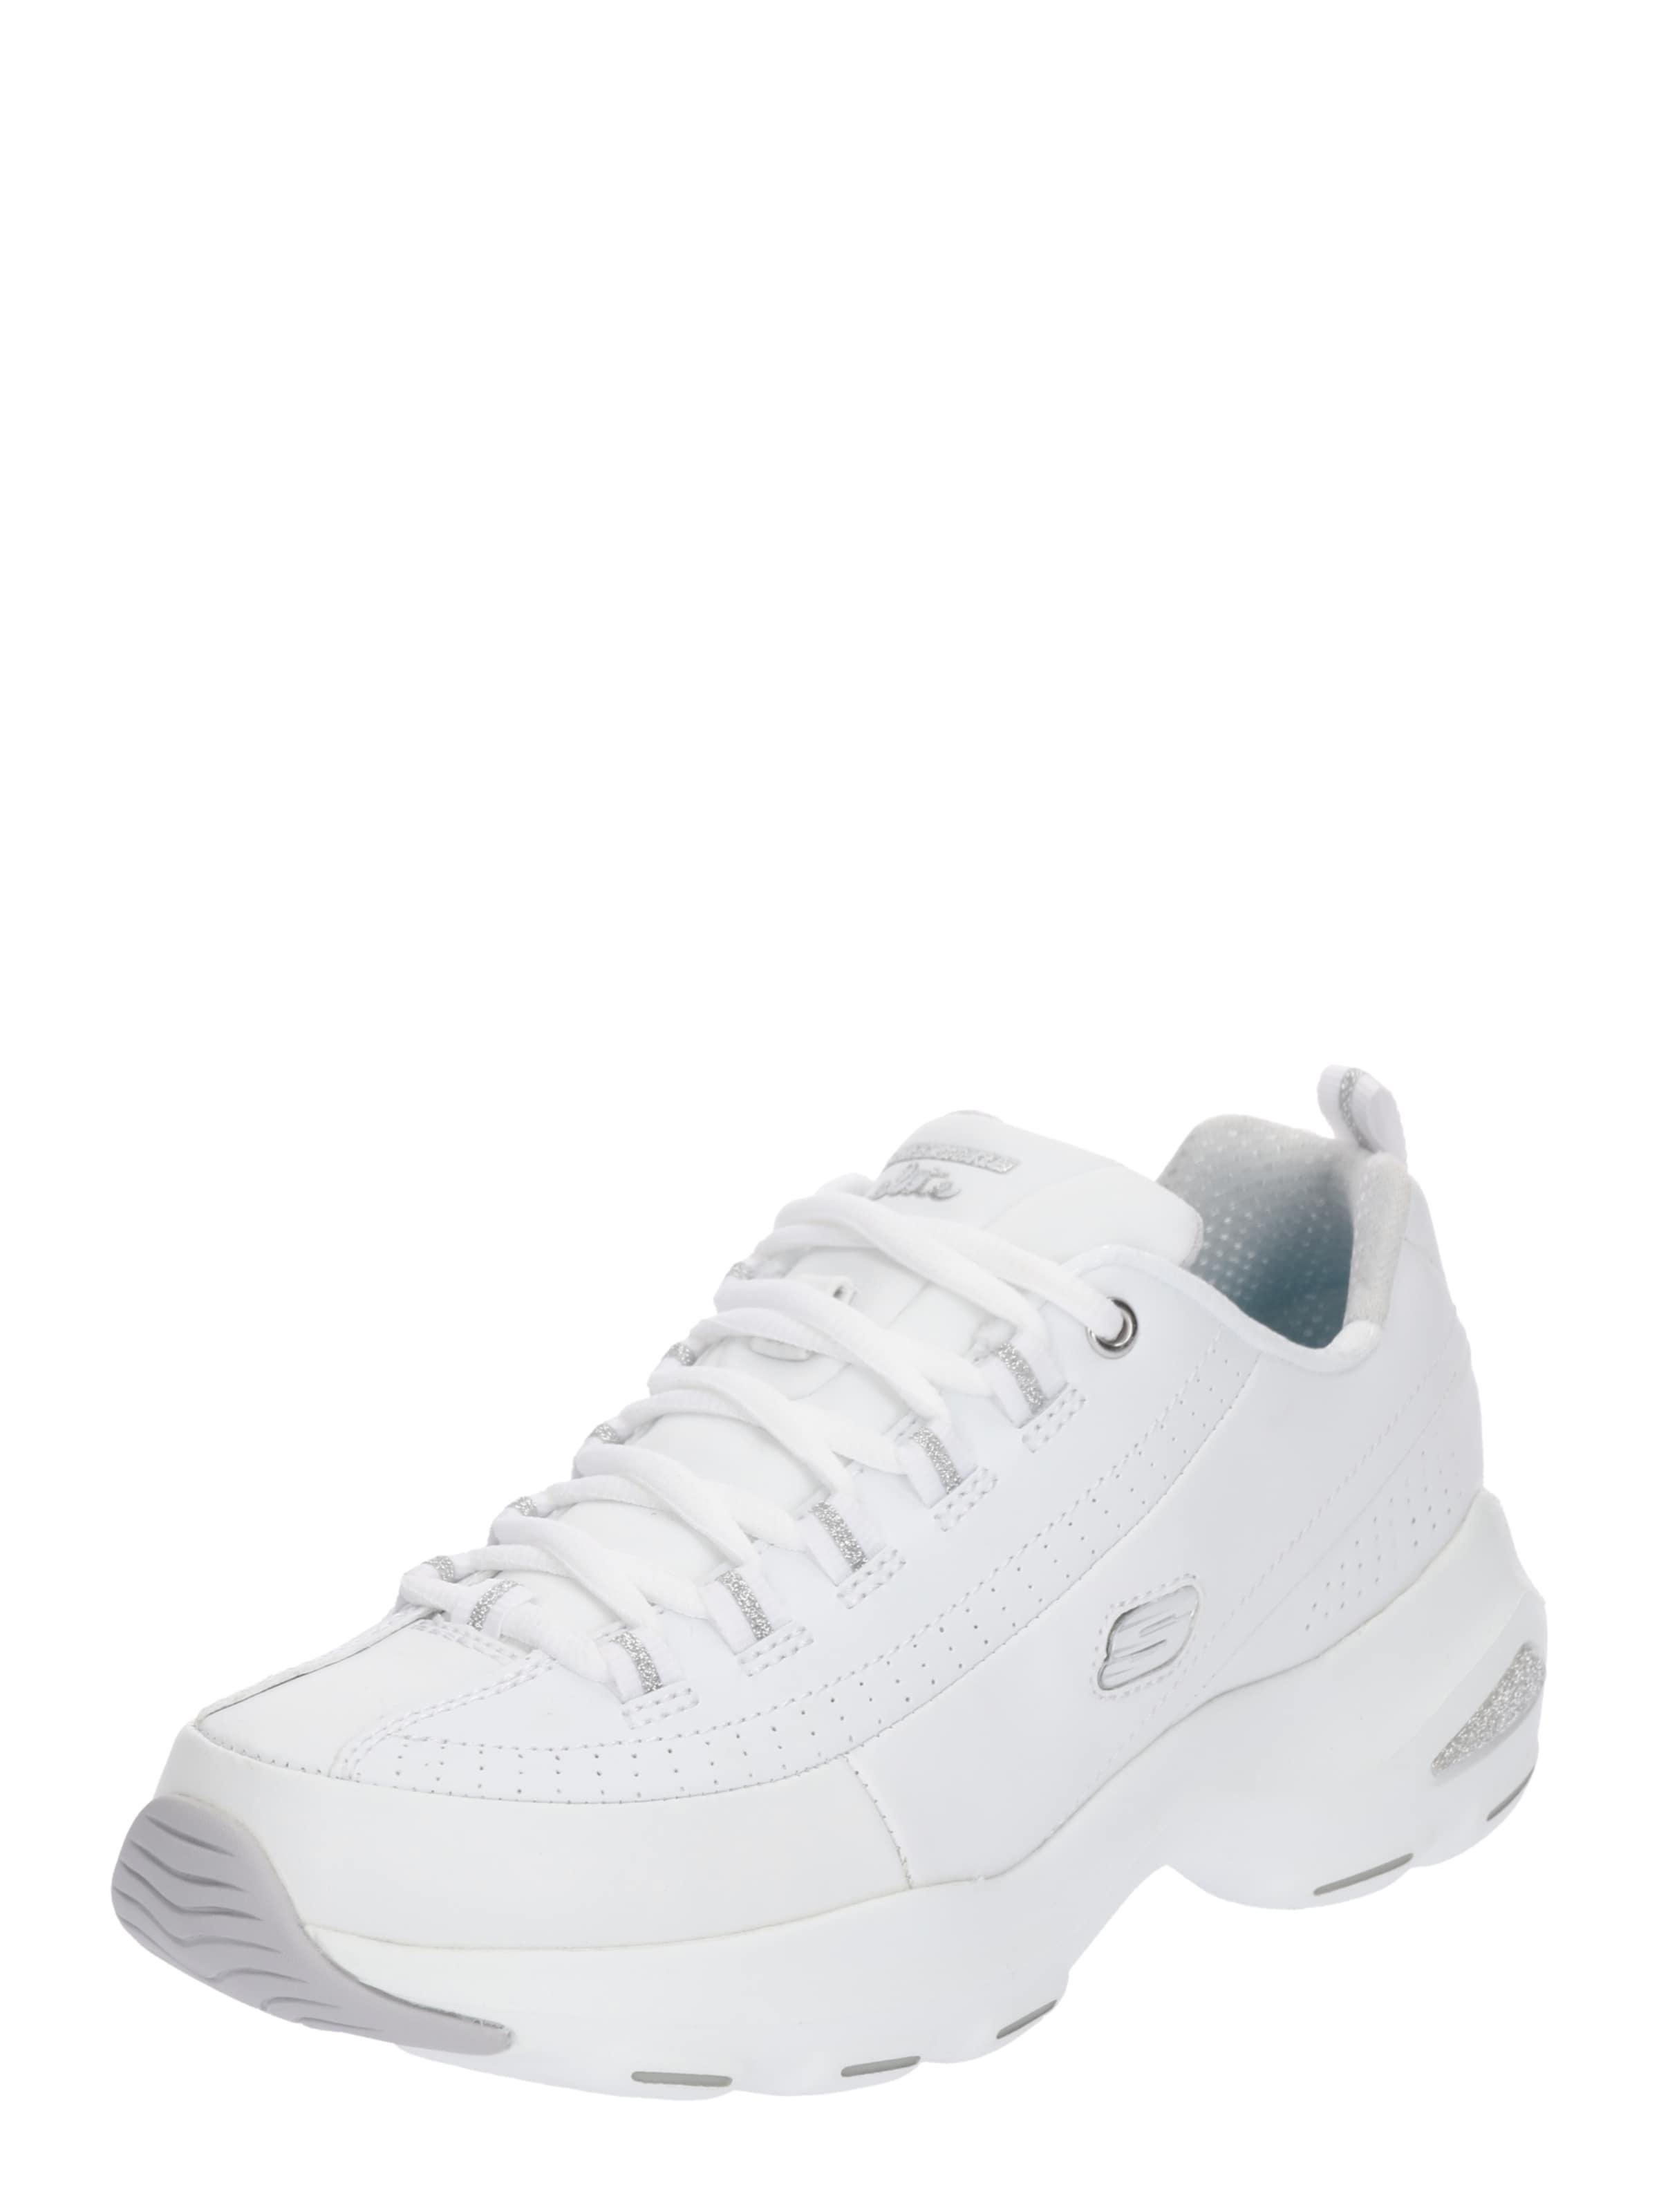 SKECHERS Sneaker  D Lite Ultra Illusions